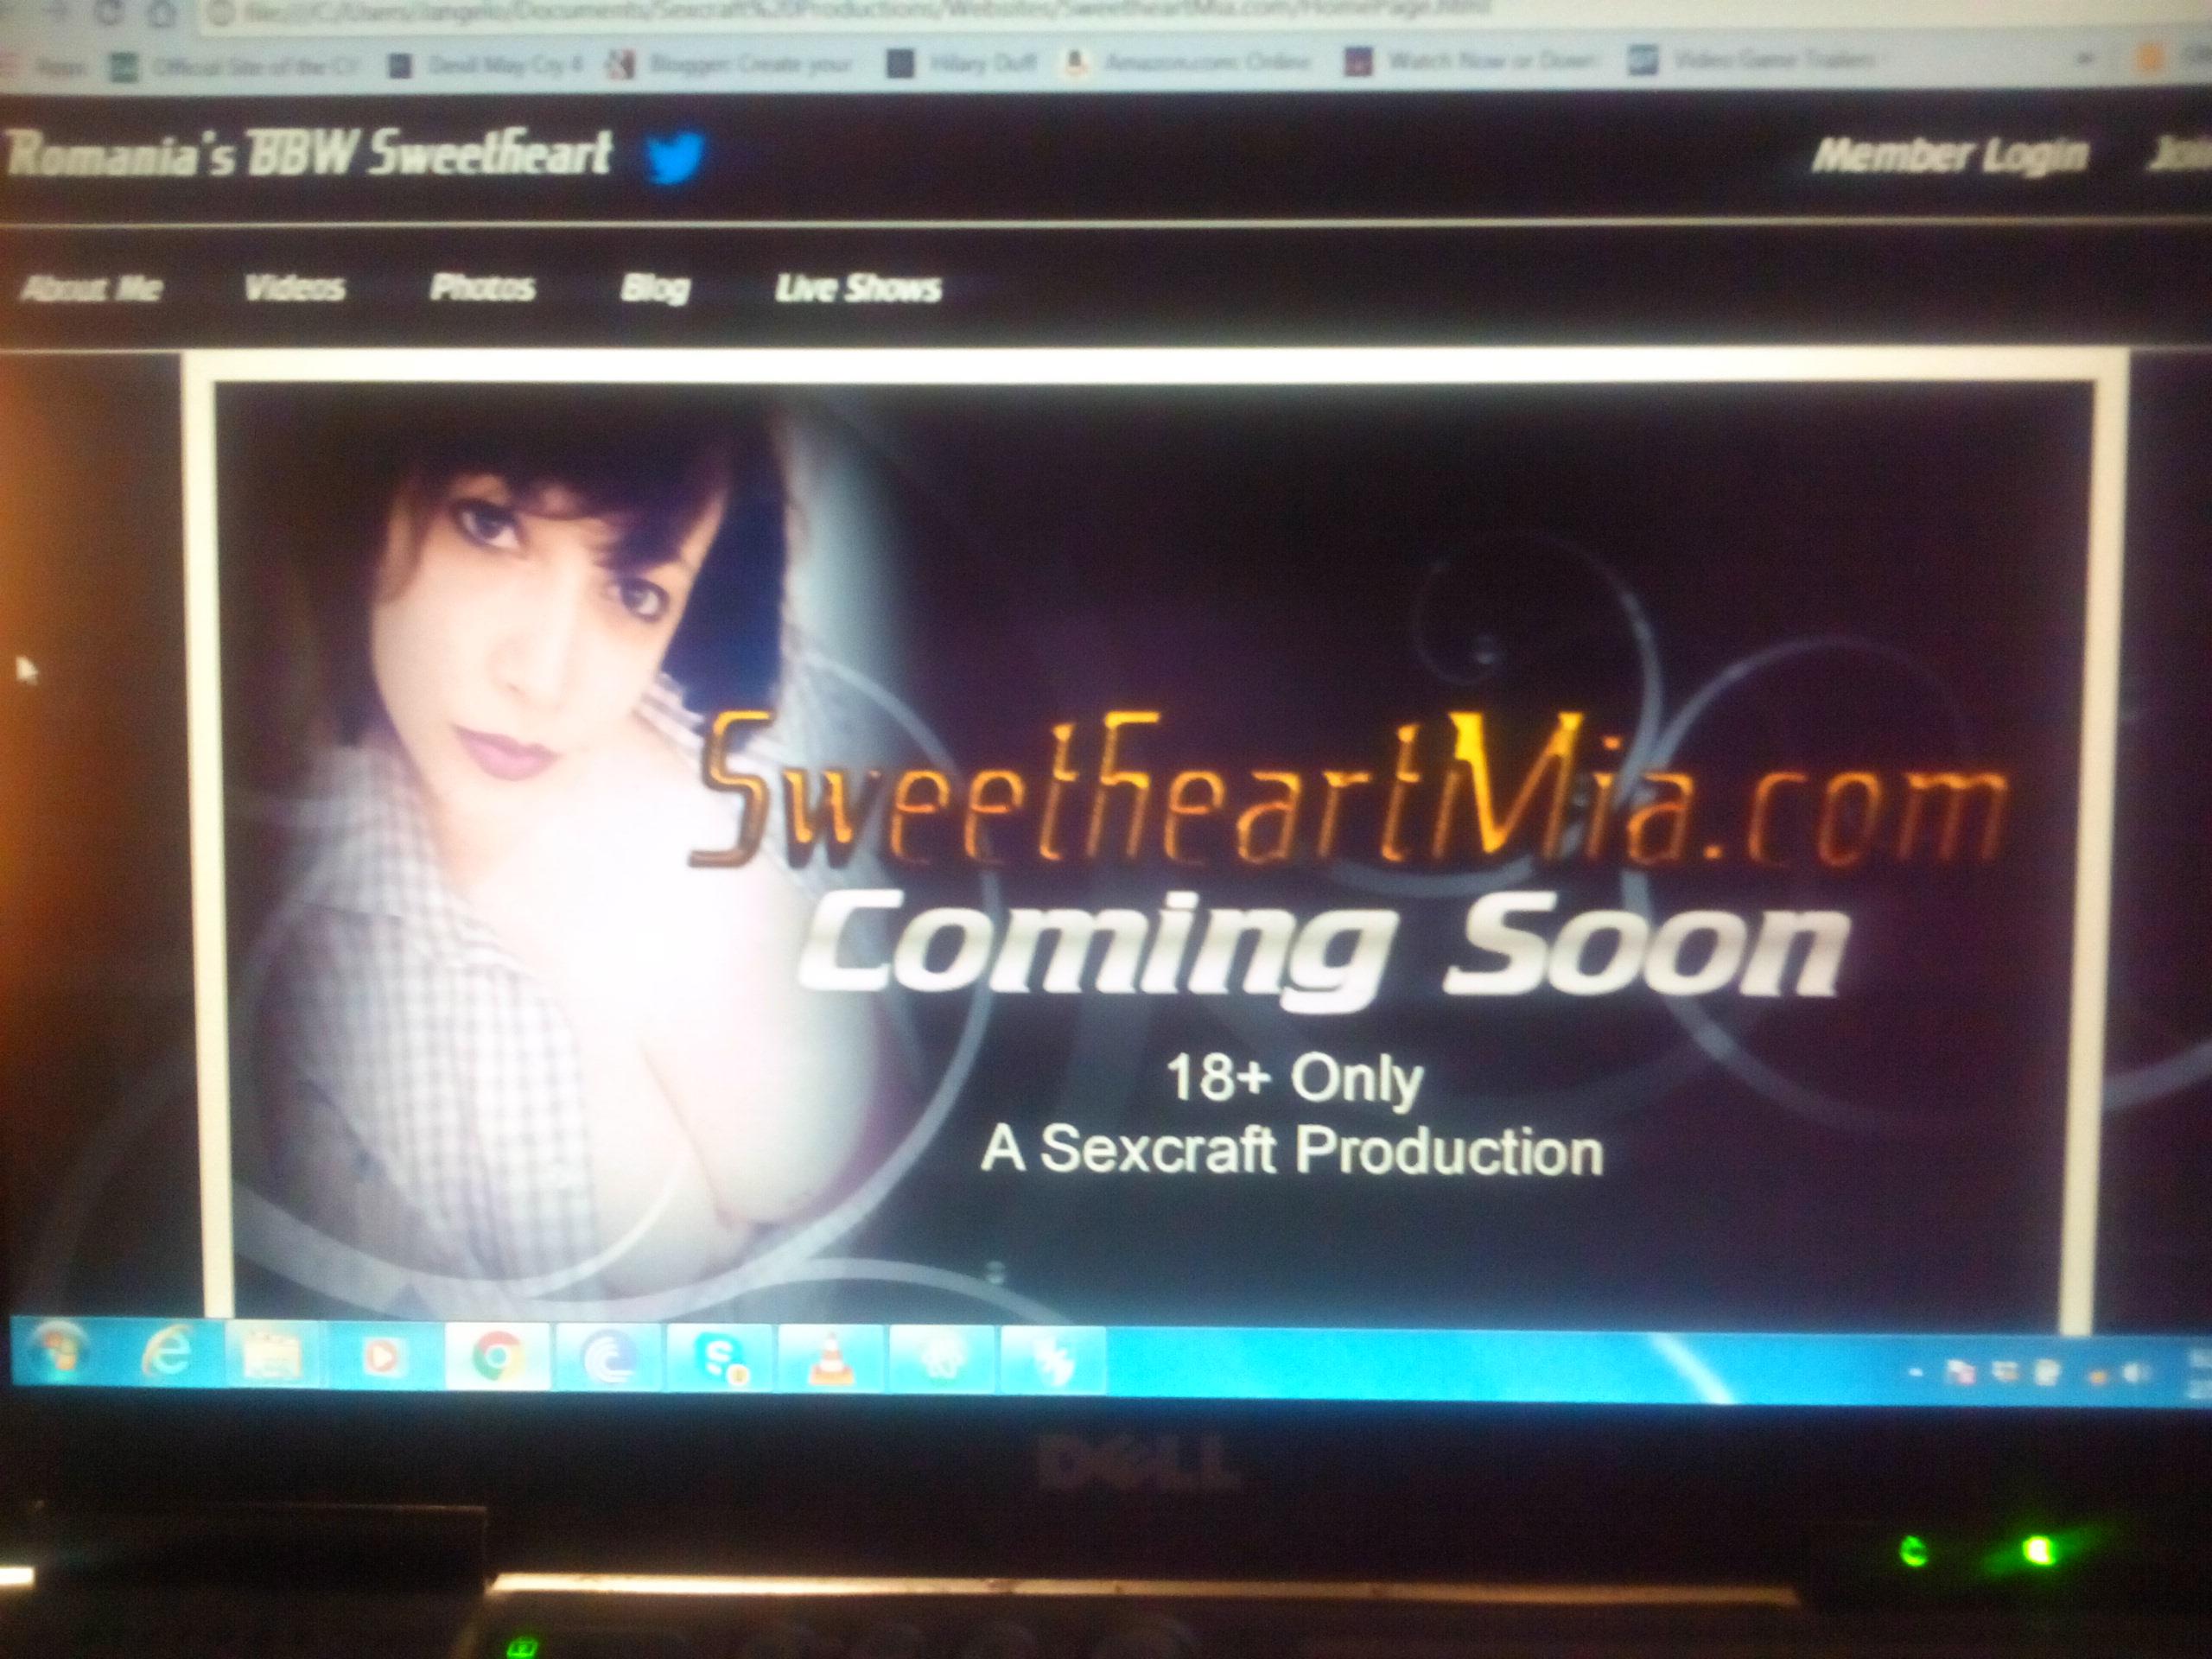 Sweetheart-Mia